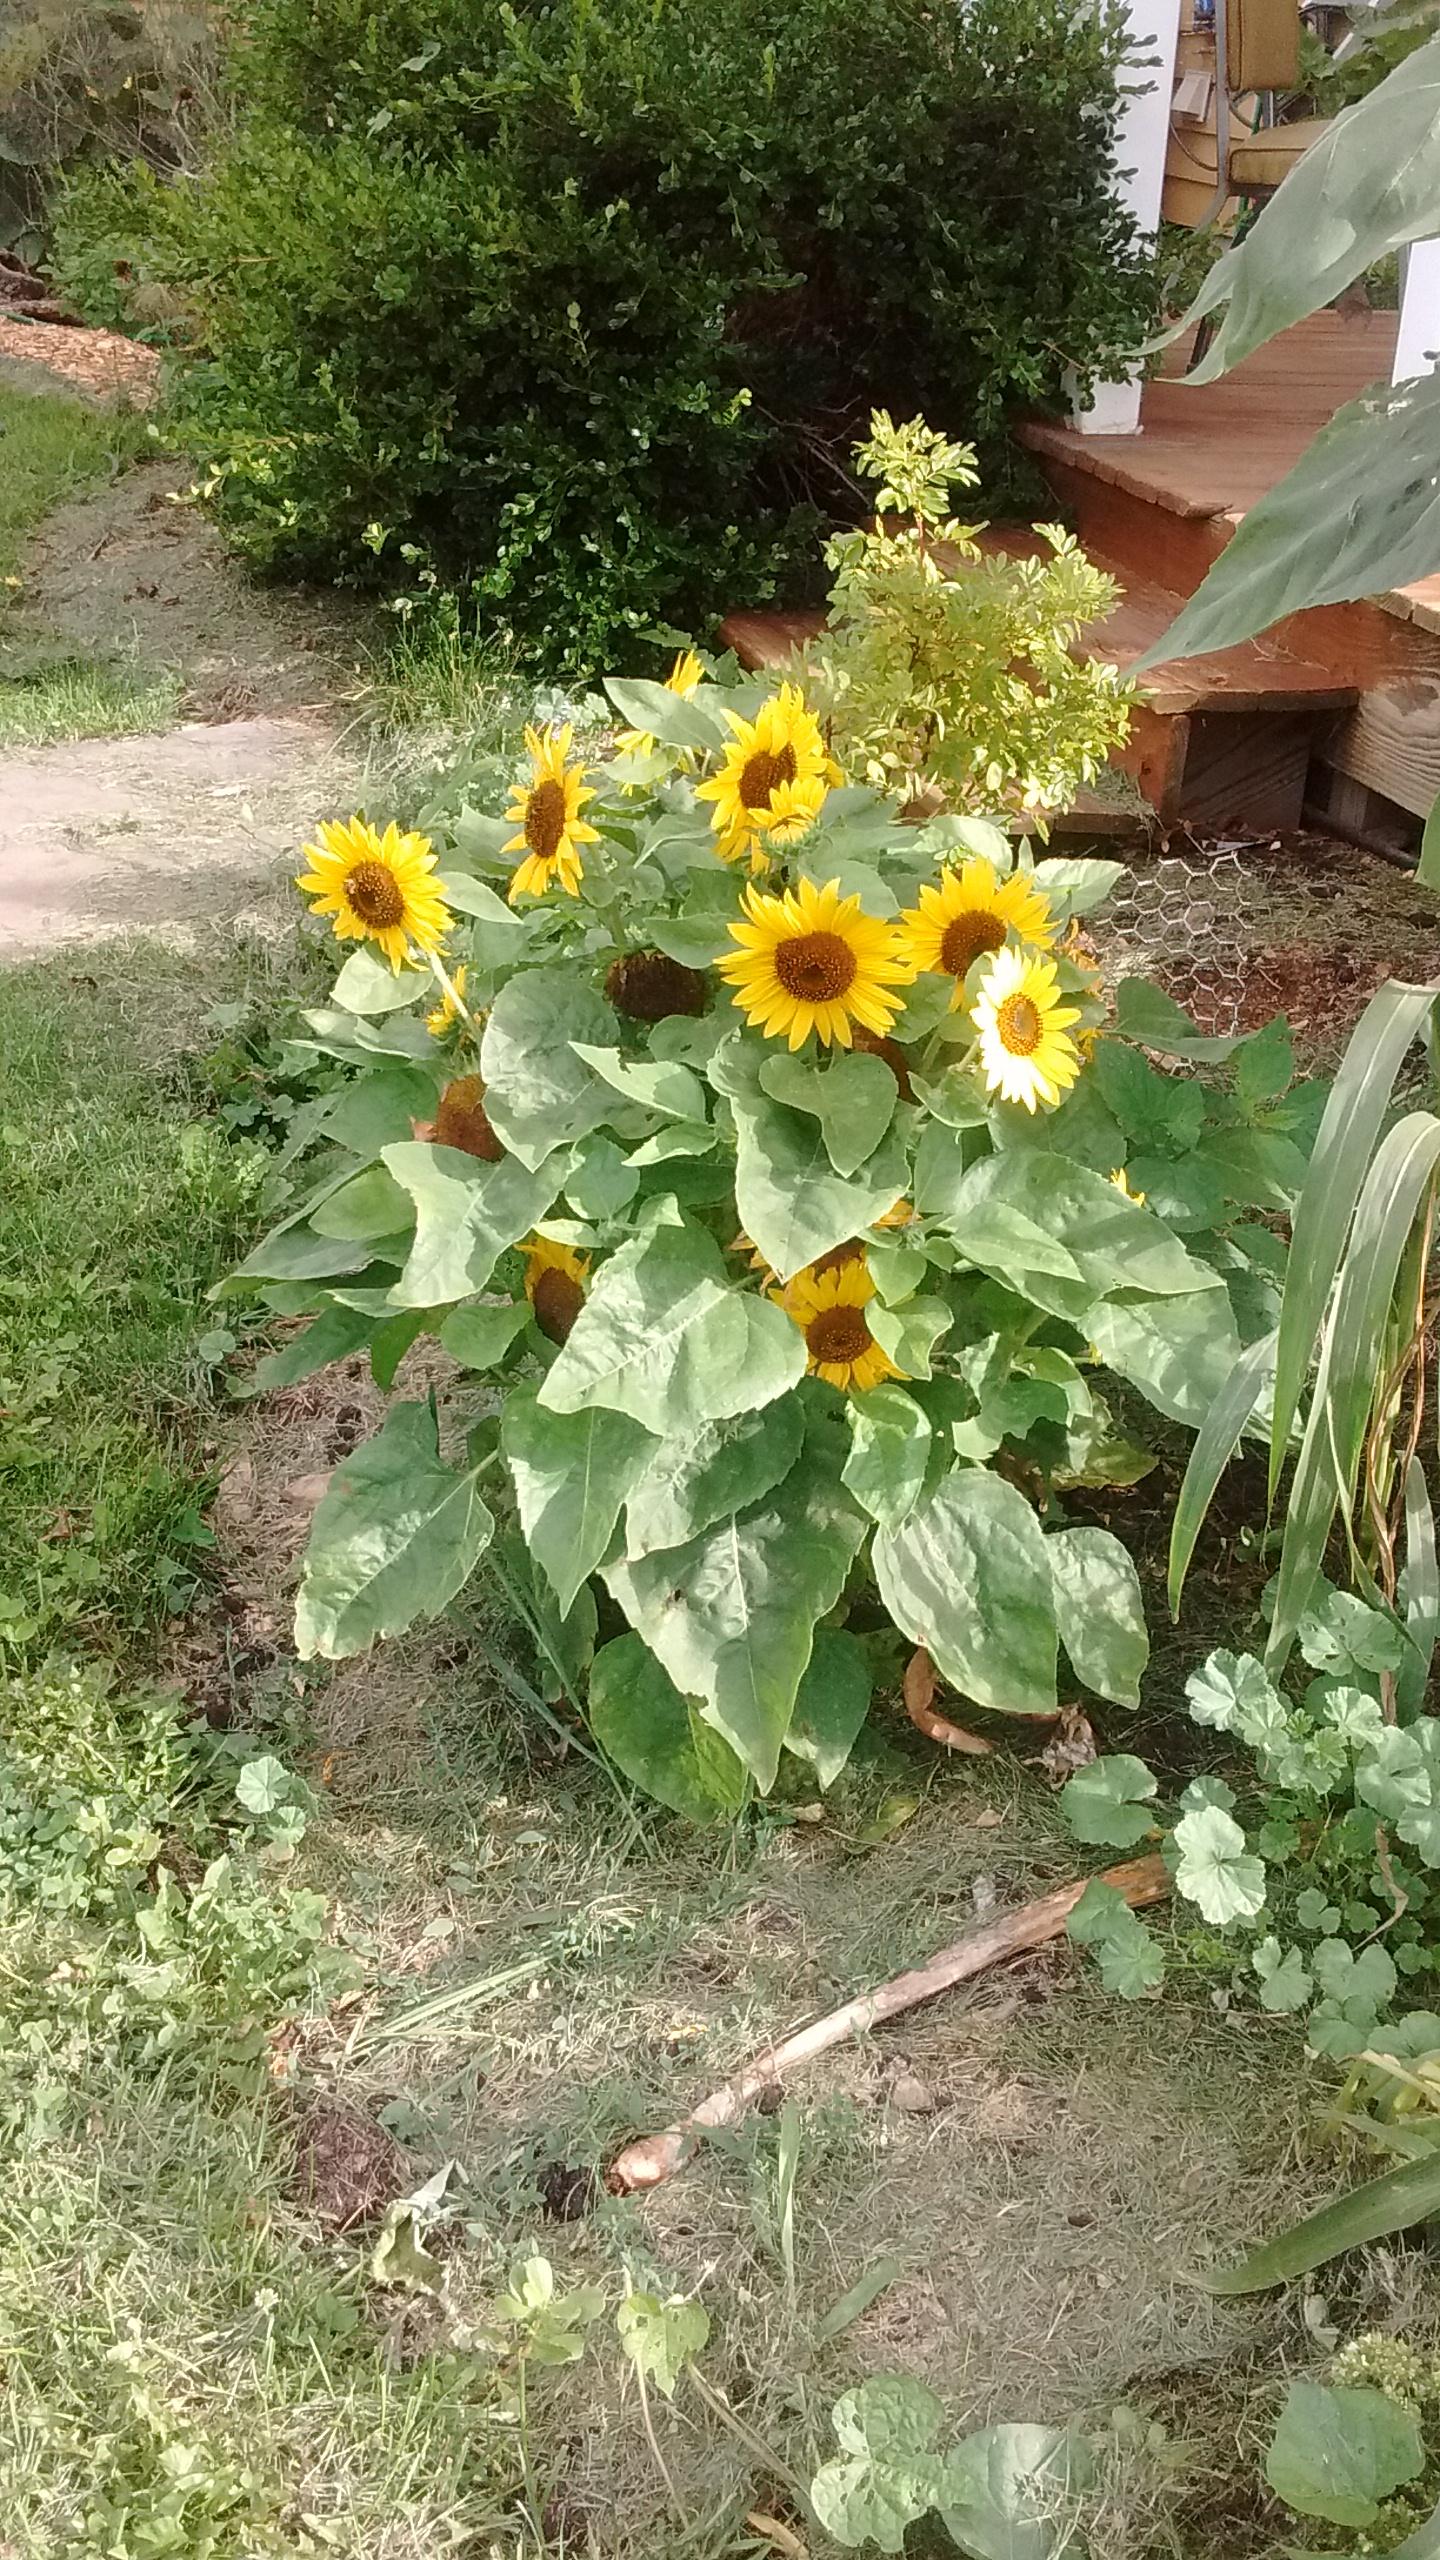 dwarf sunflowers.jpg